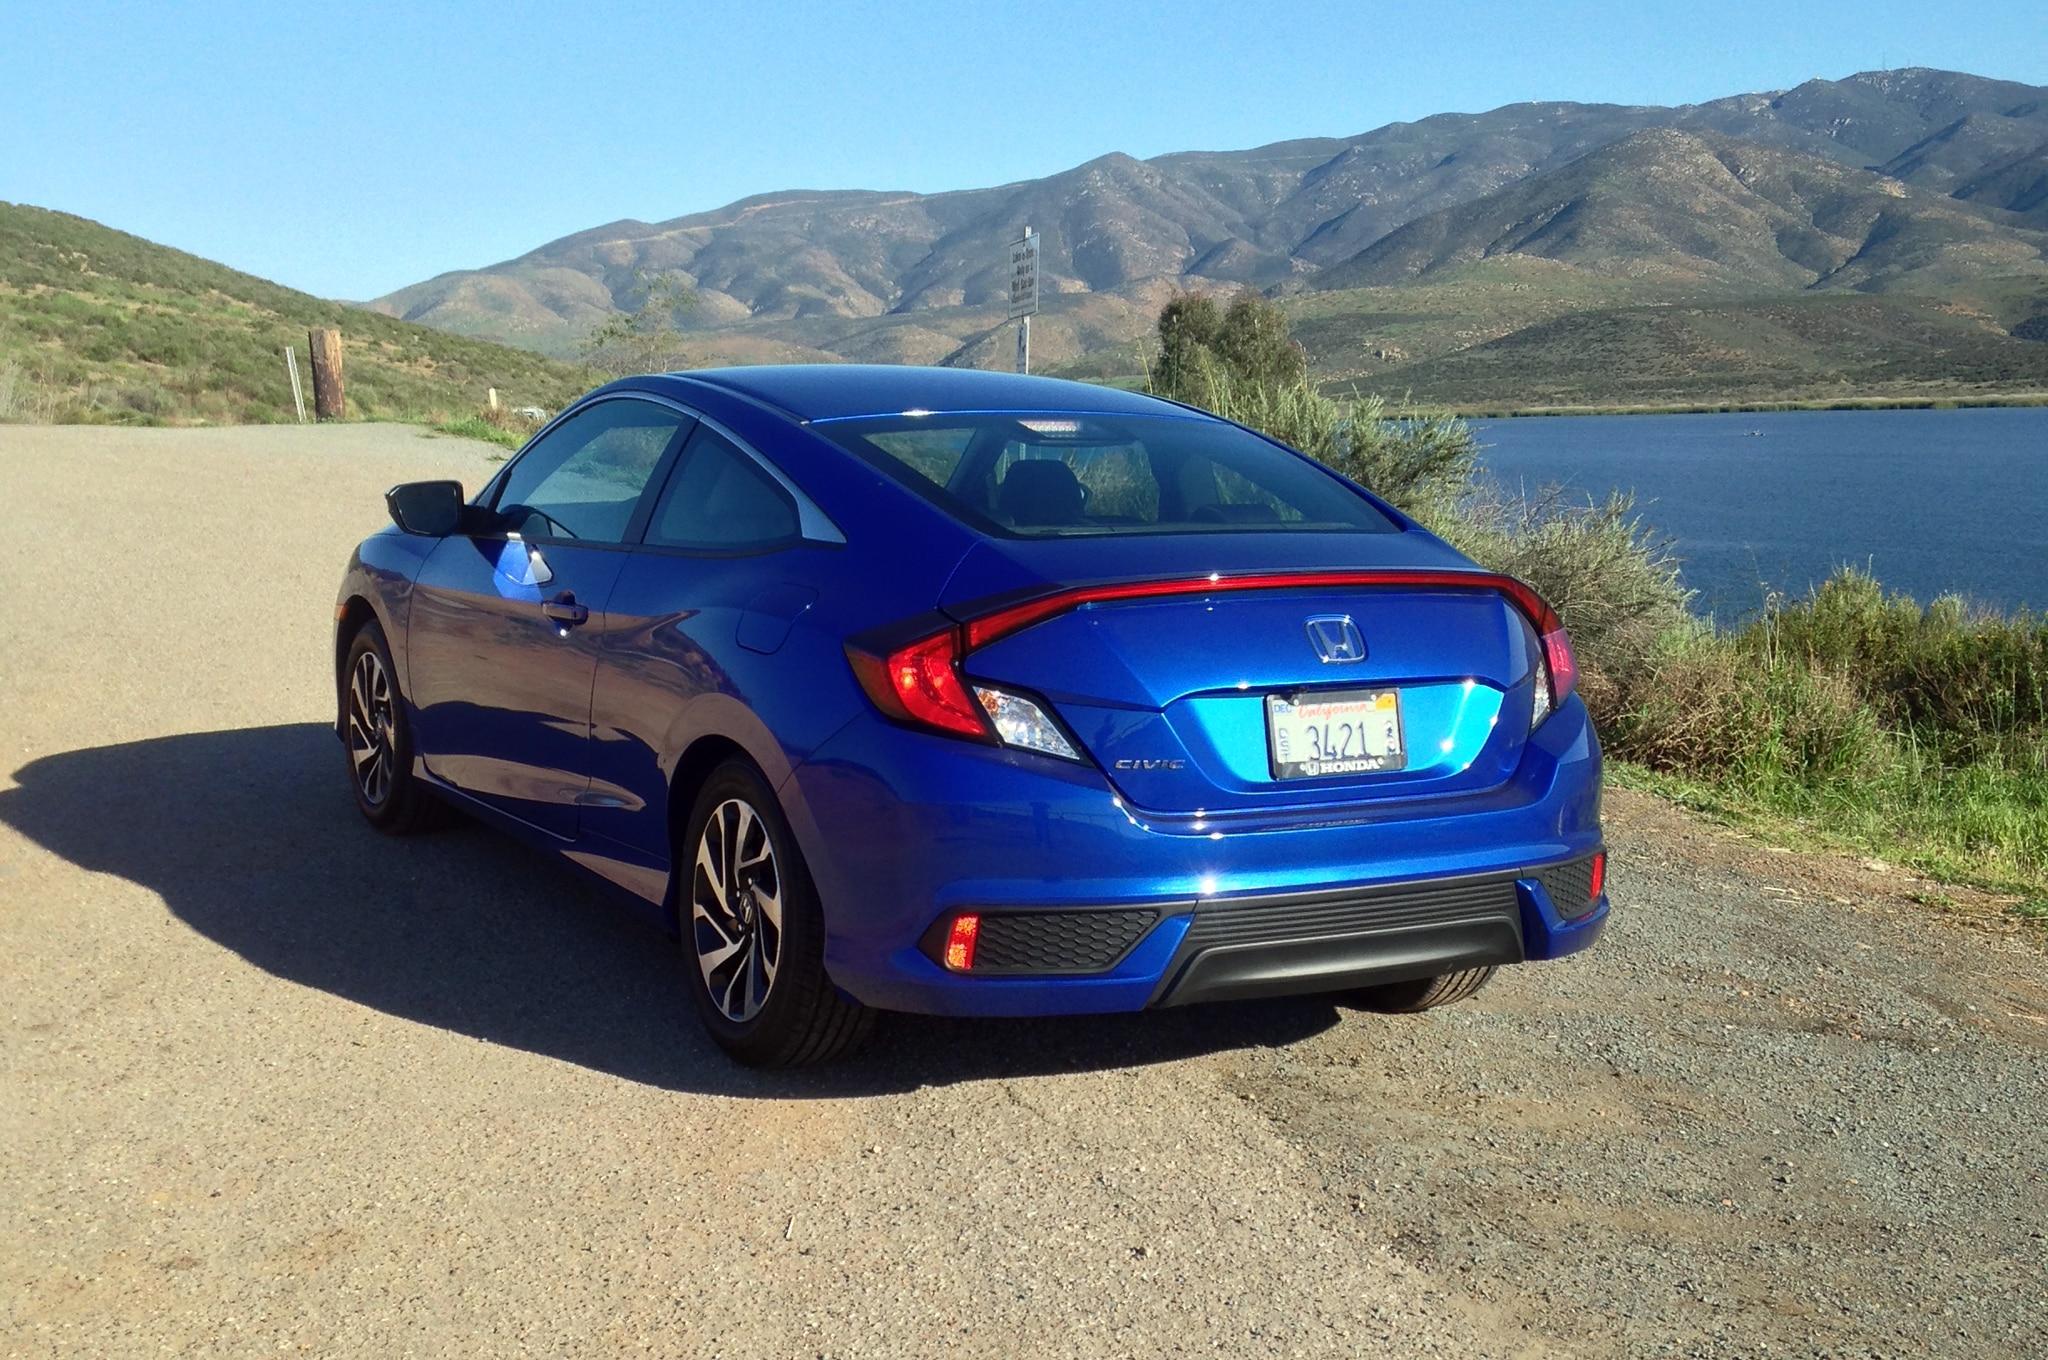 2016 Honda Civic Coupe Pricing Detailed, Starts at $19,885 ...